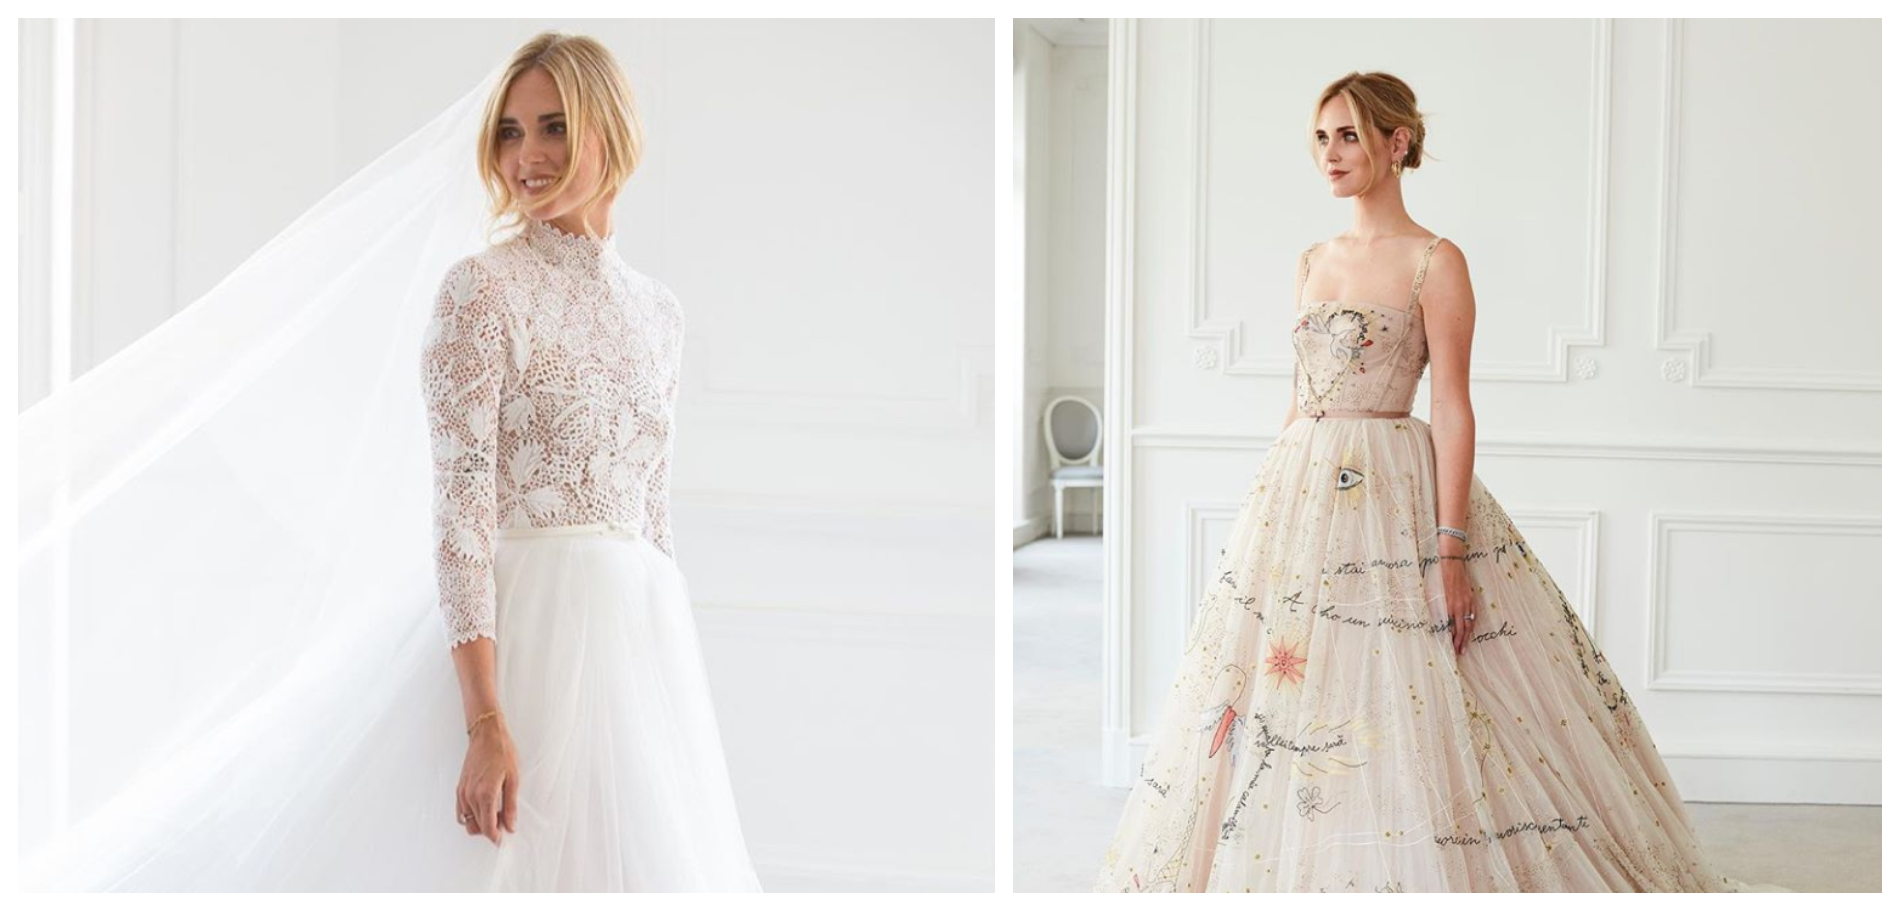 Pourquoi La Deuxieme Robe De Mariee Dior De Chiara Ferragni